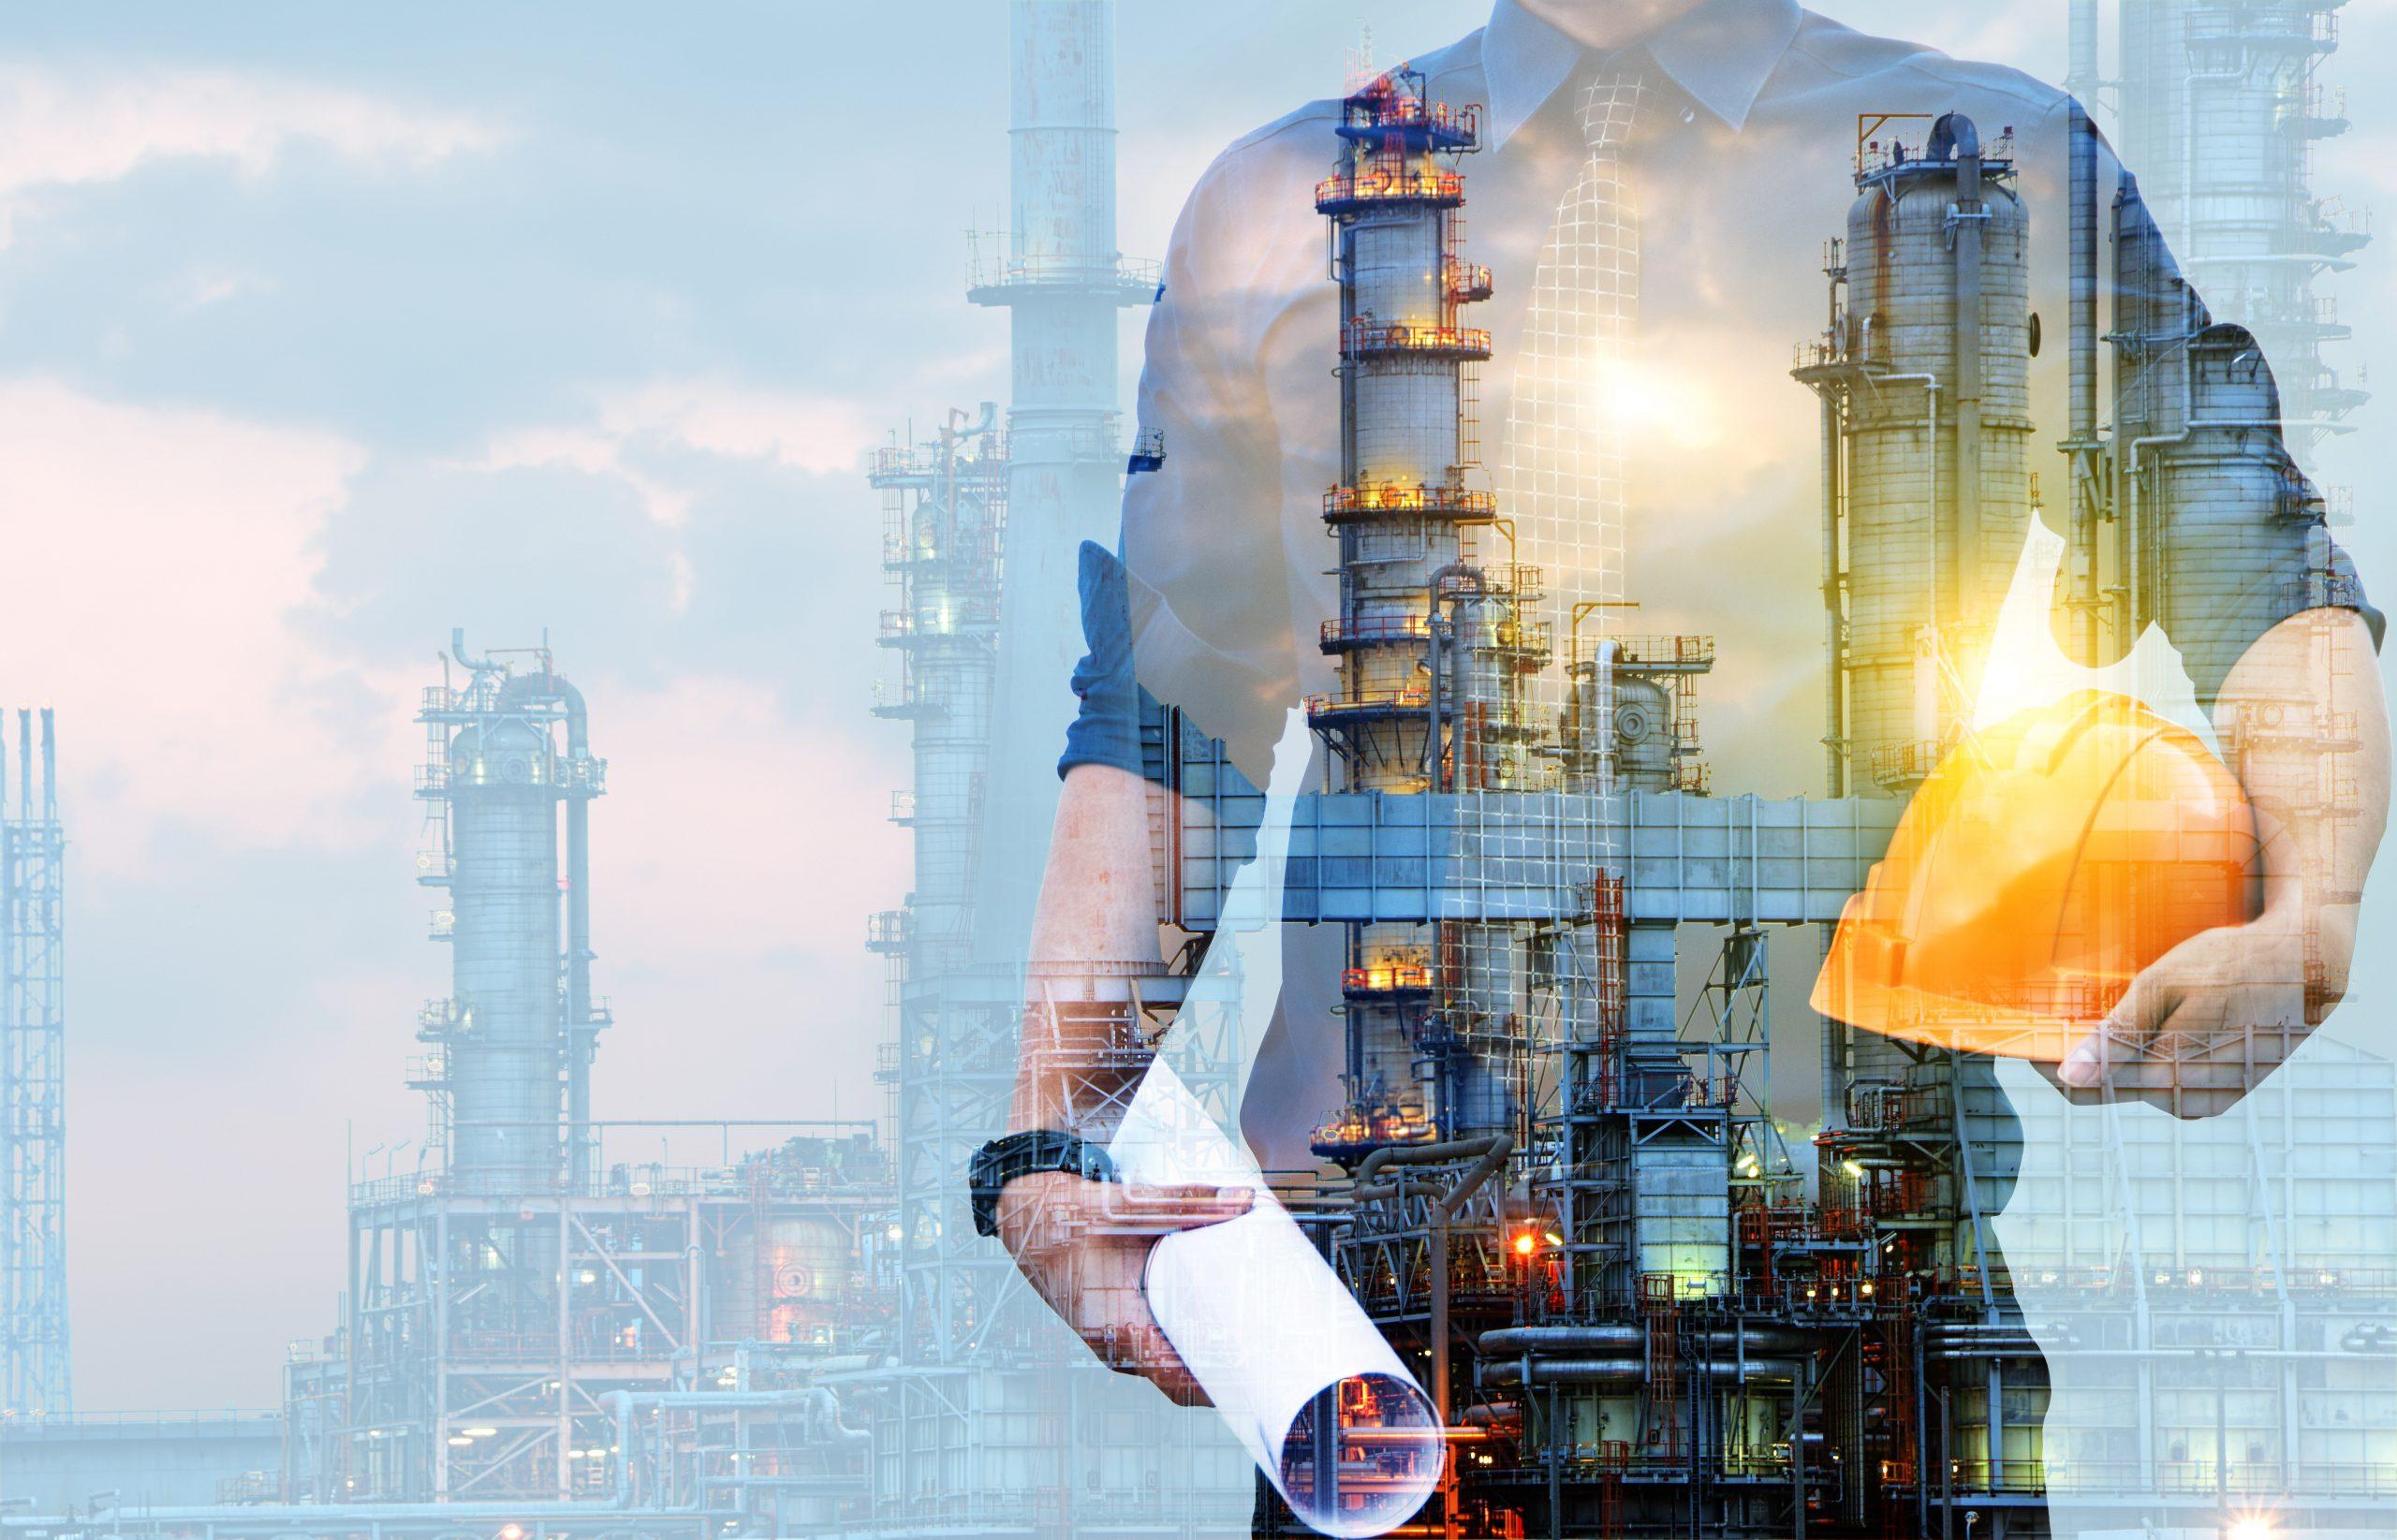 rmda-ss-energy-industry-construction.2560.1645